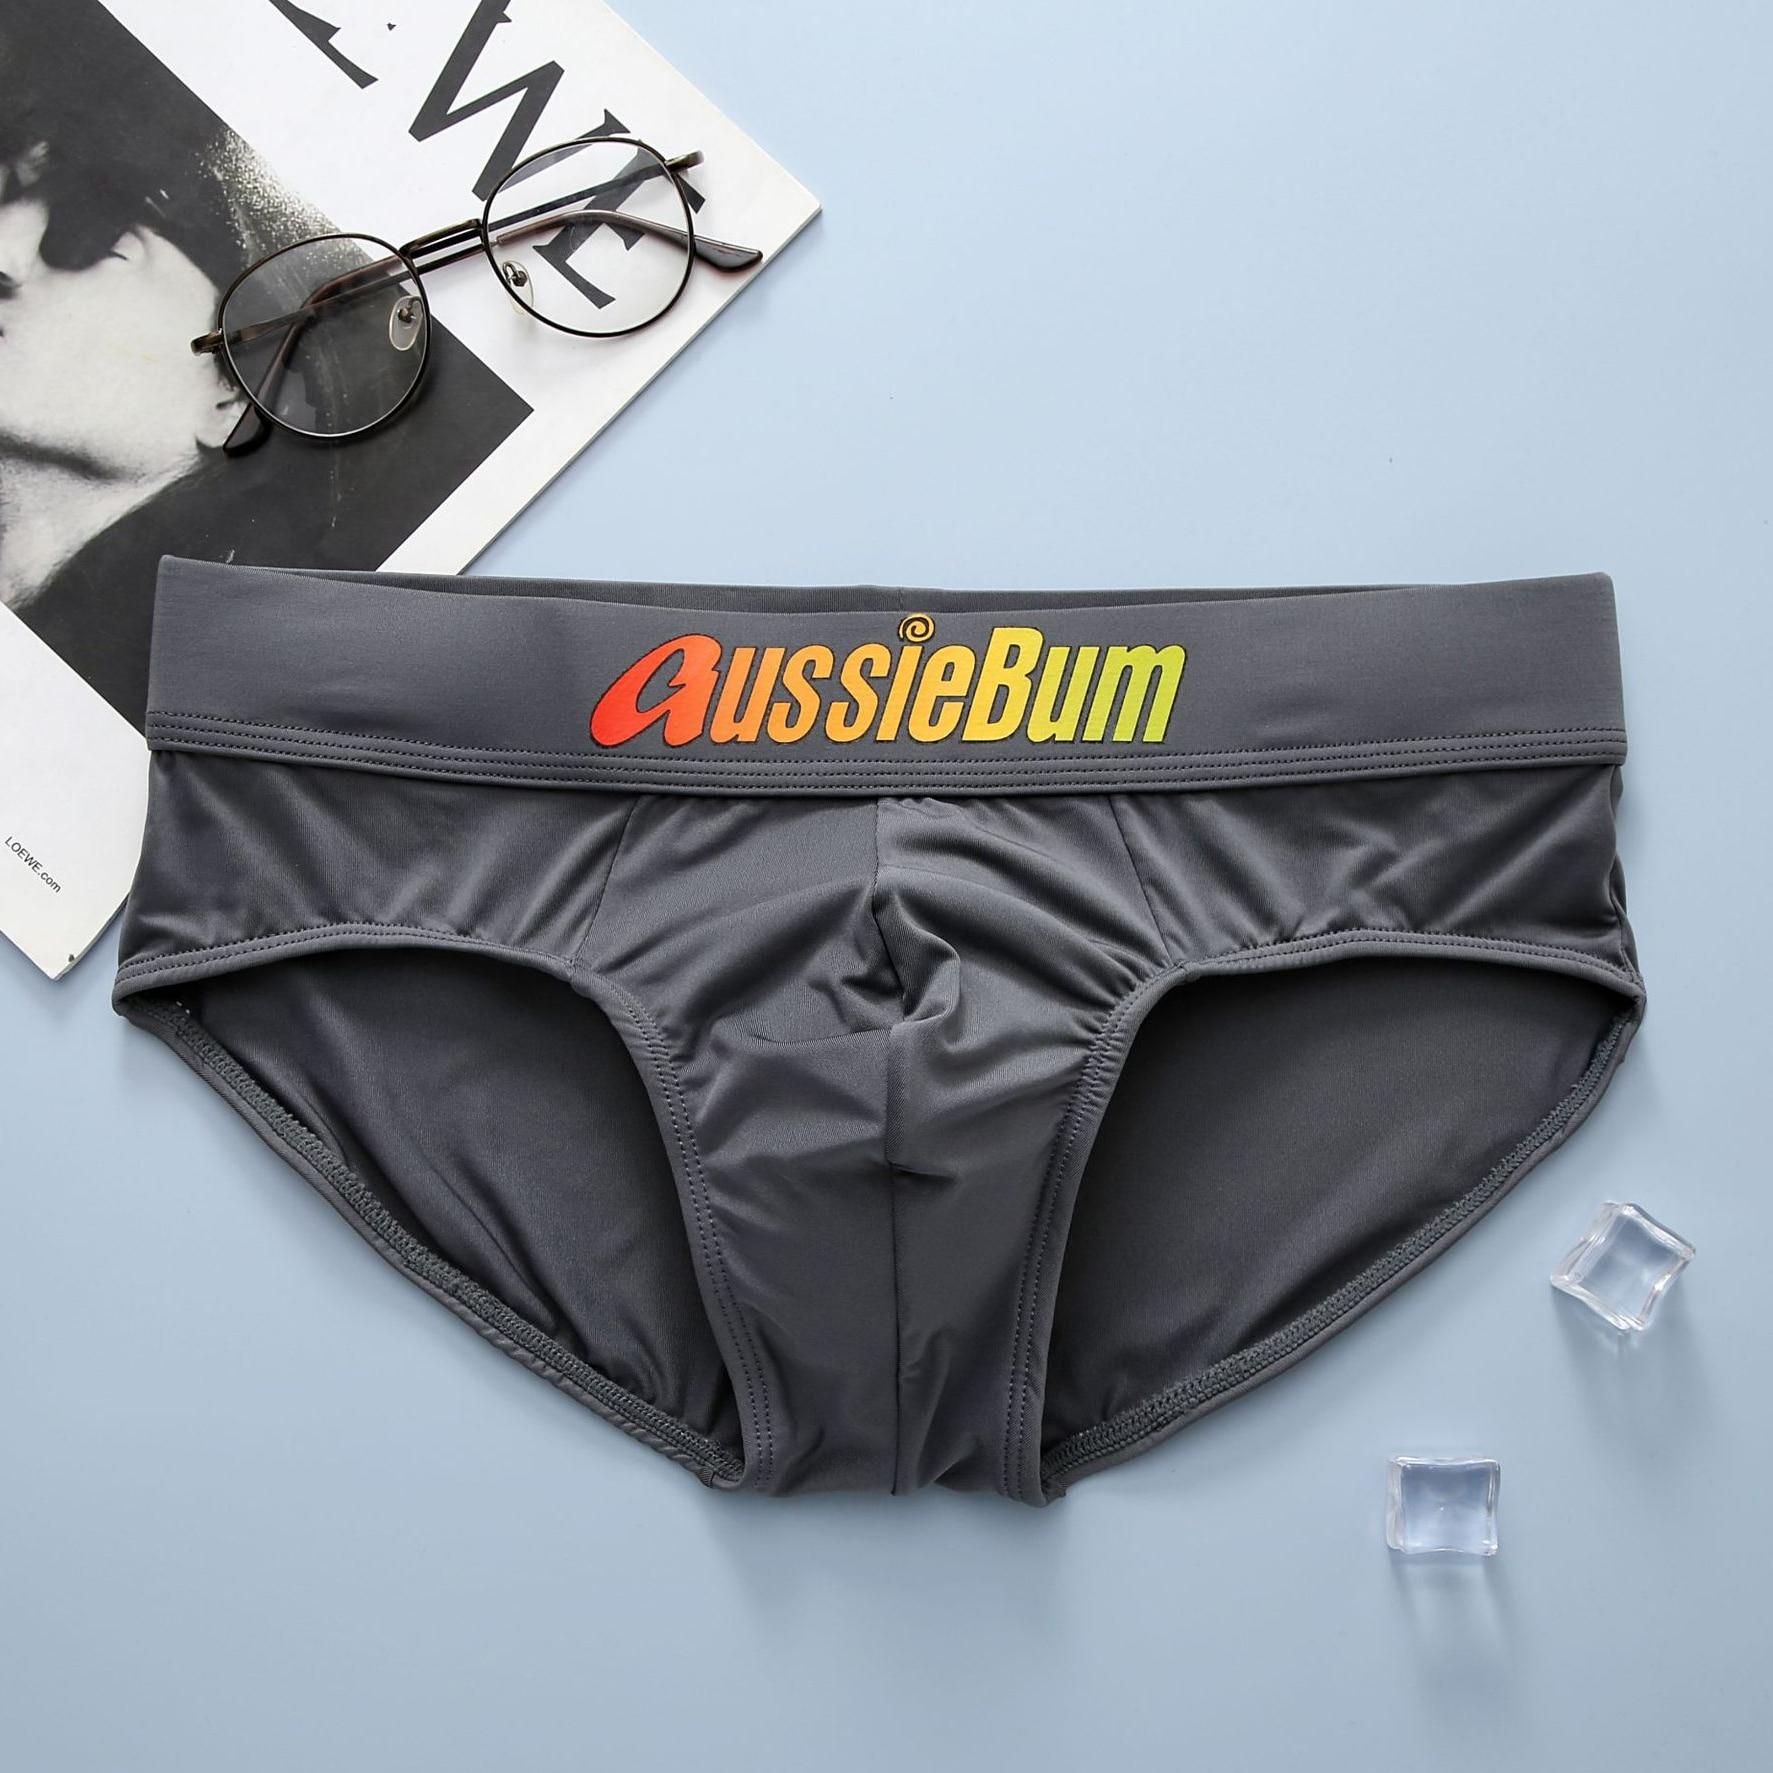 Aussiebum men's briefs milk silk low waist elastic comfortable u convex bag colorful words 5